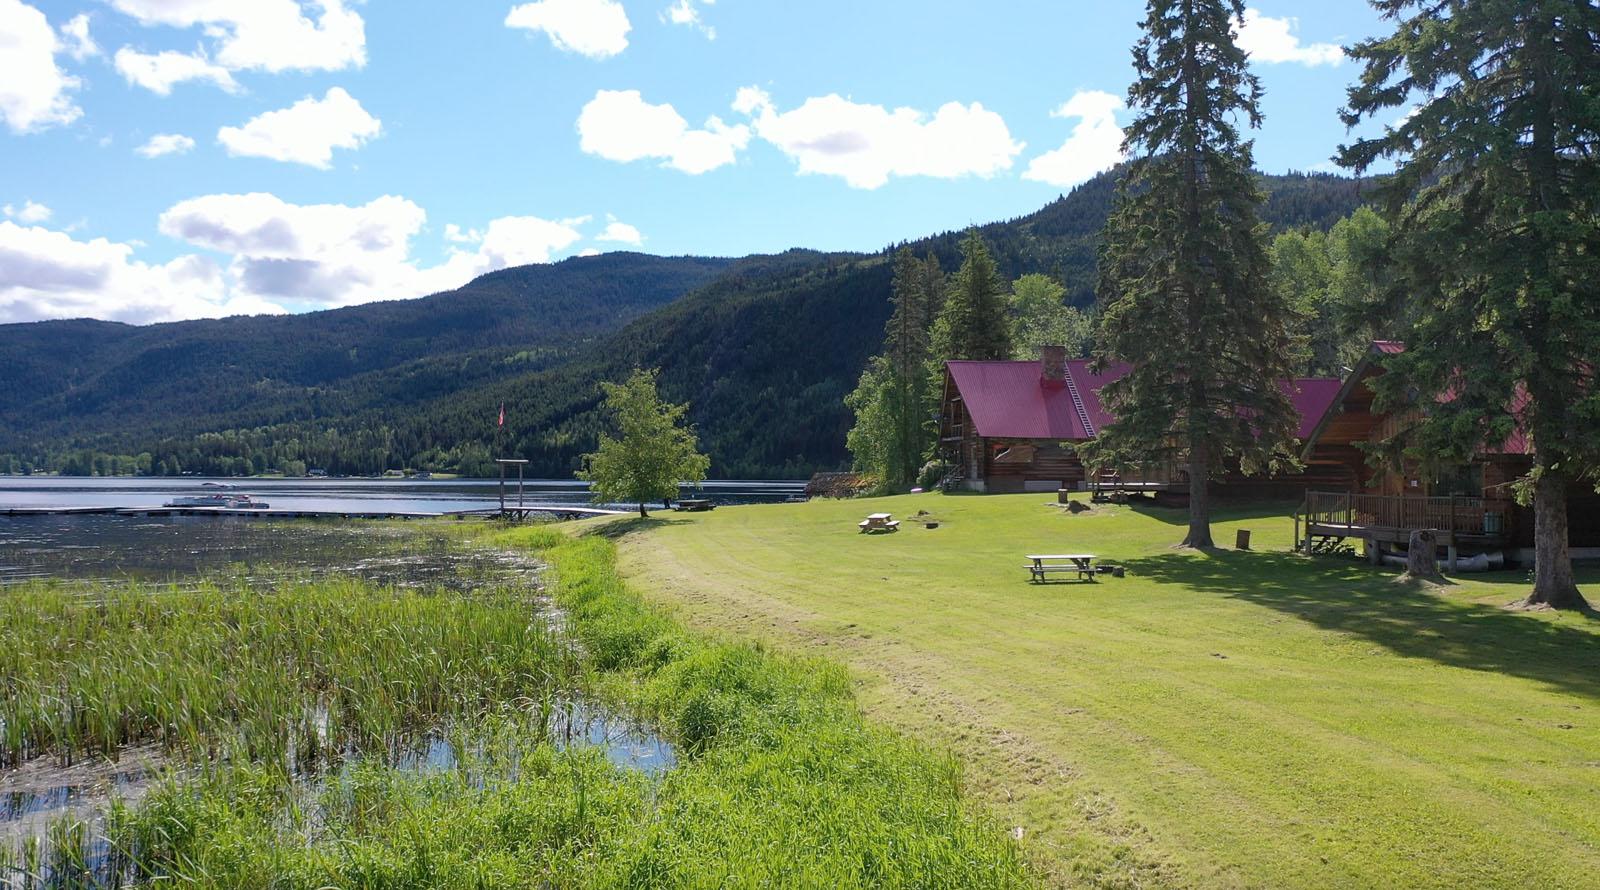 Canim lake resort 24